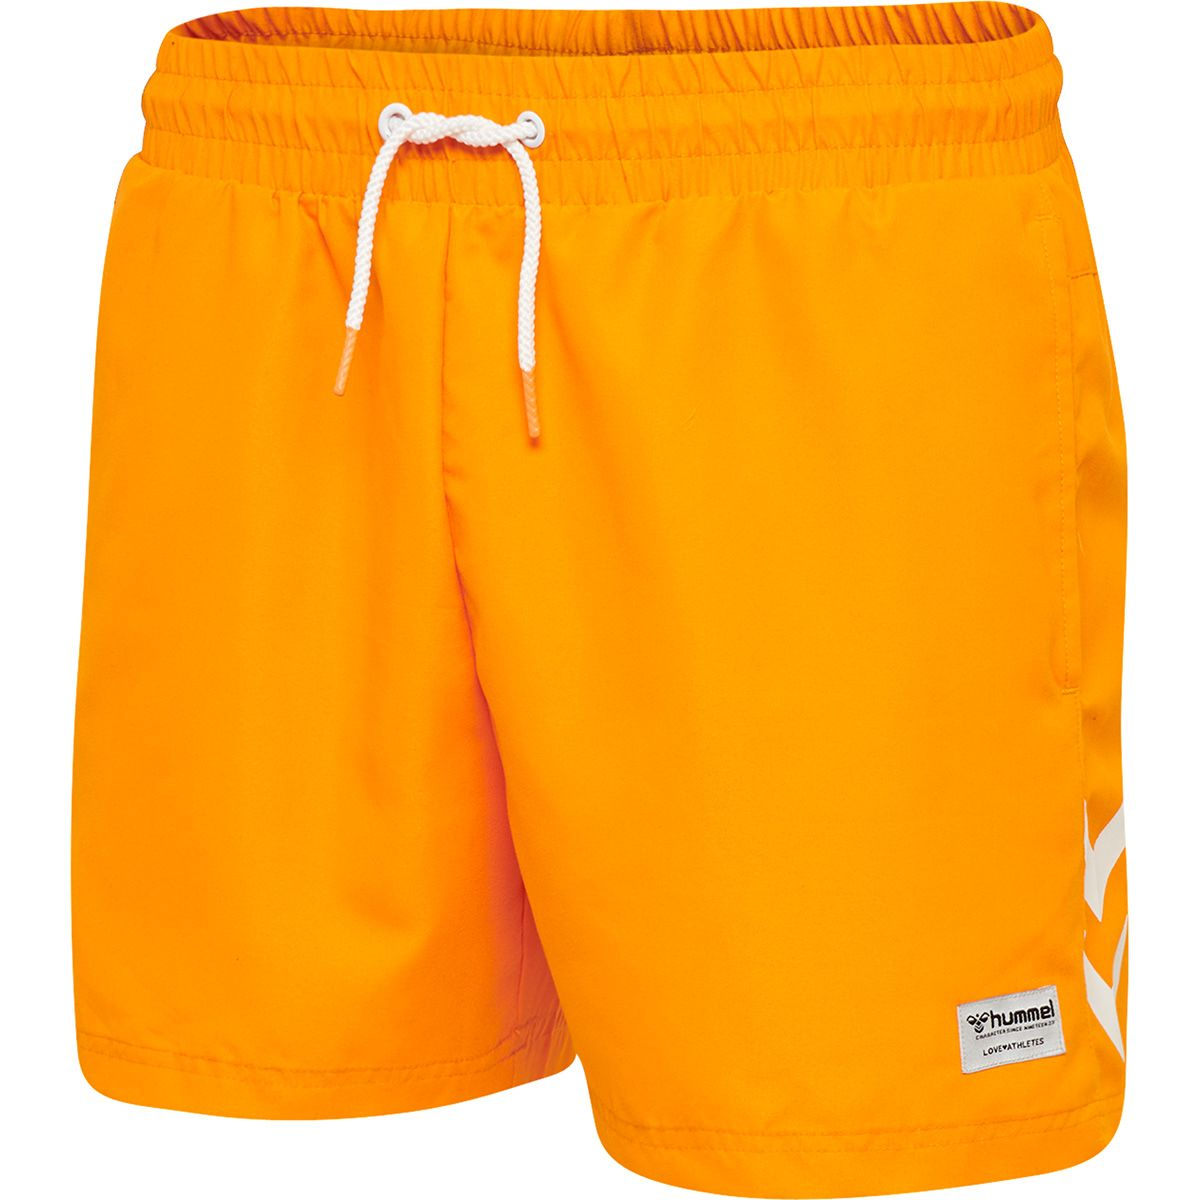 Hummel Rence Board shorts